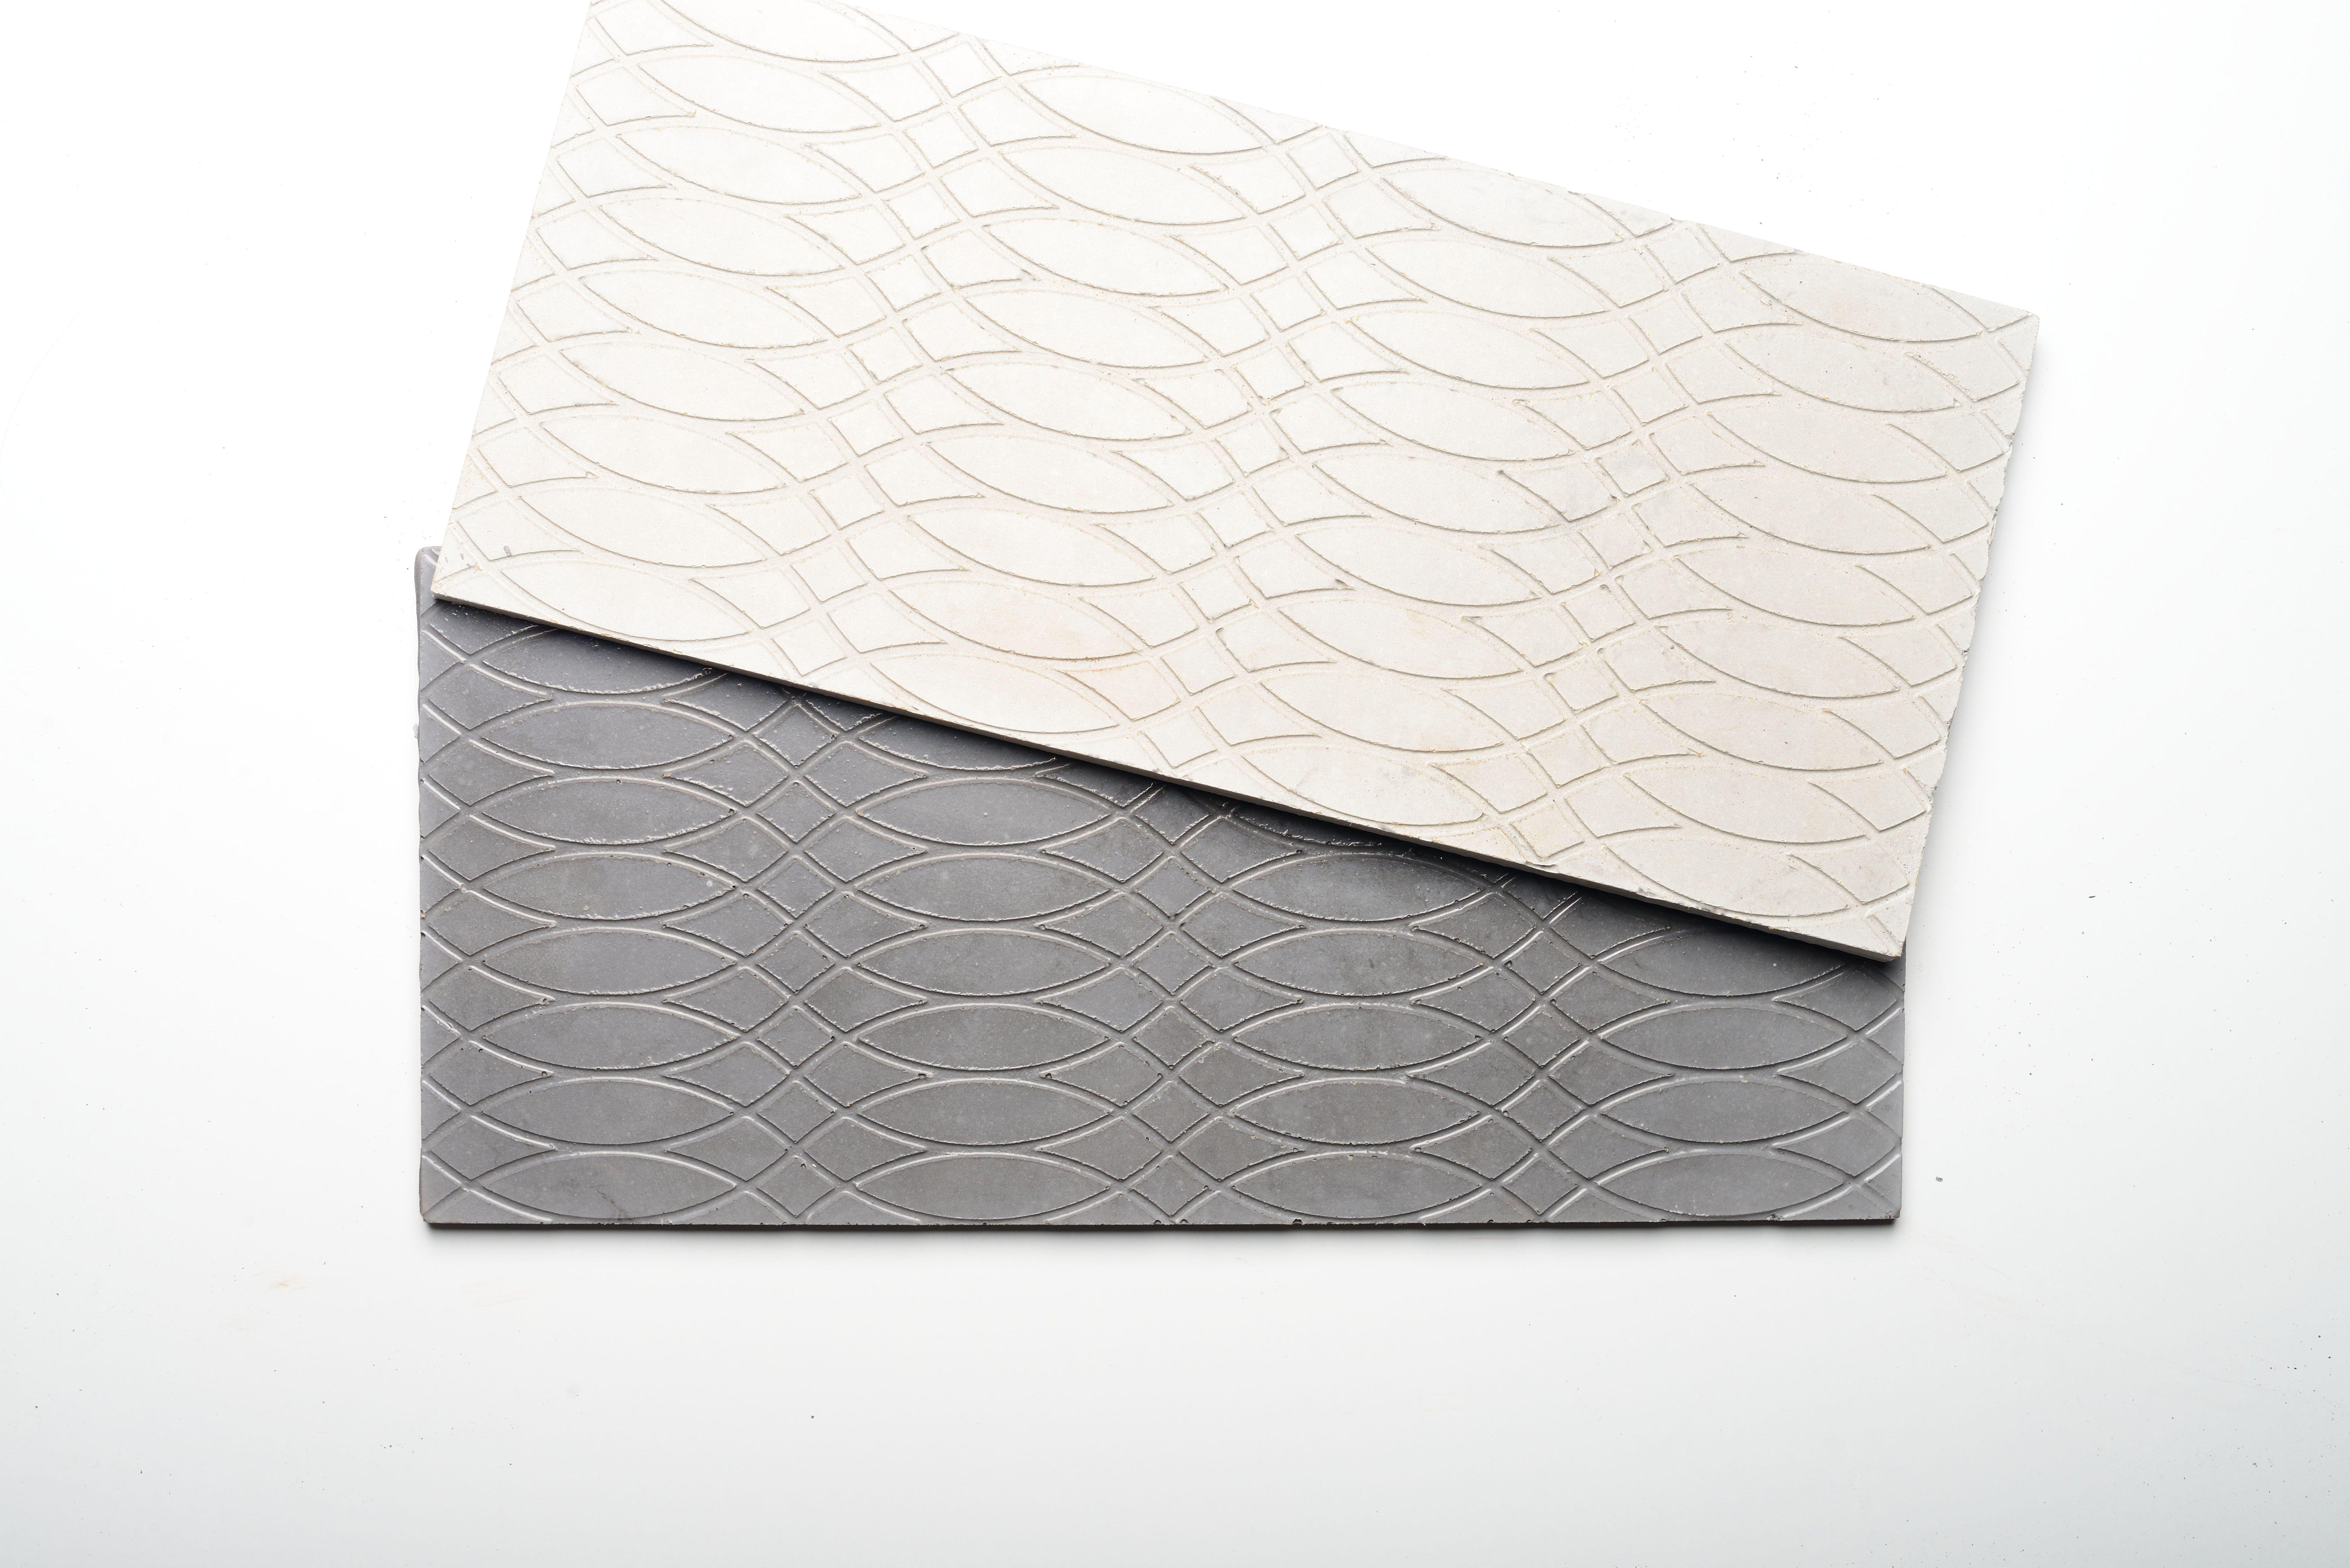 New patterned and textured tiles at Lowinfo  #concretetiles #concretefashion #concreteinteriors #interiordesign #design #pattern #texture #concrete